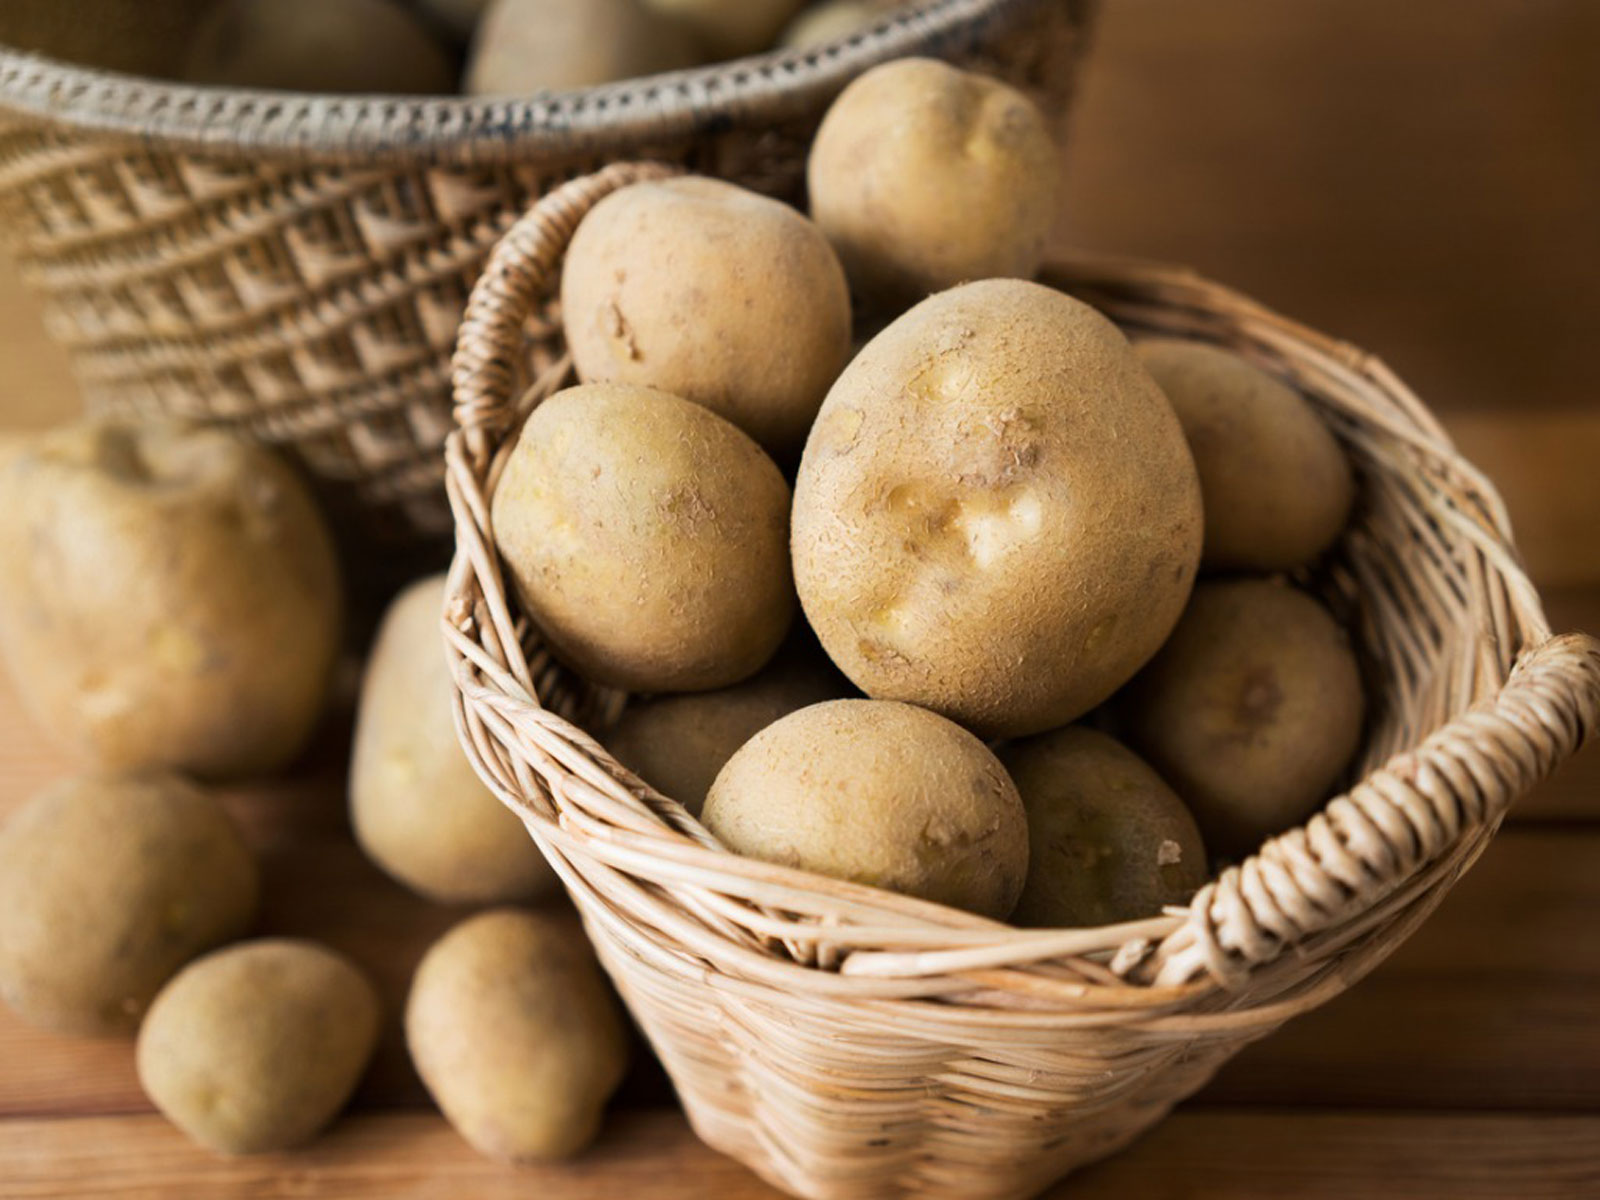 bảo quản khoai tây 2